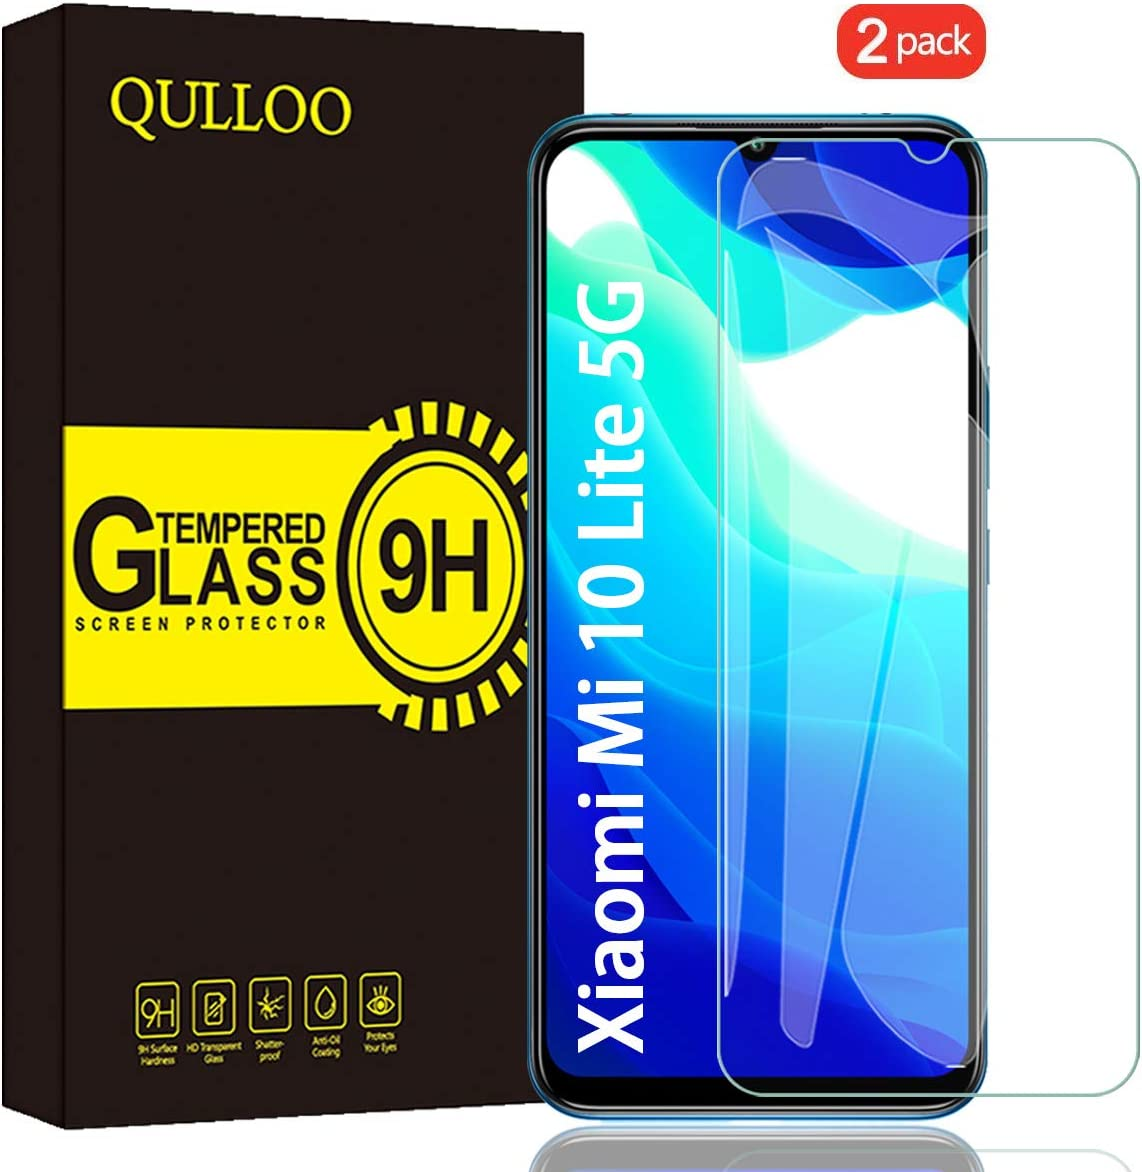 QULLOO Protector de Pantalla Xiaomi Mi 10 Lite 5G, Cristal Templado [9H Dureza][Alta Definición][Fácil de Instalar] para Xiaomi Mi 10 Lite 5G